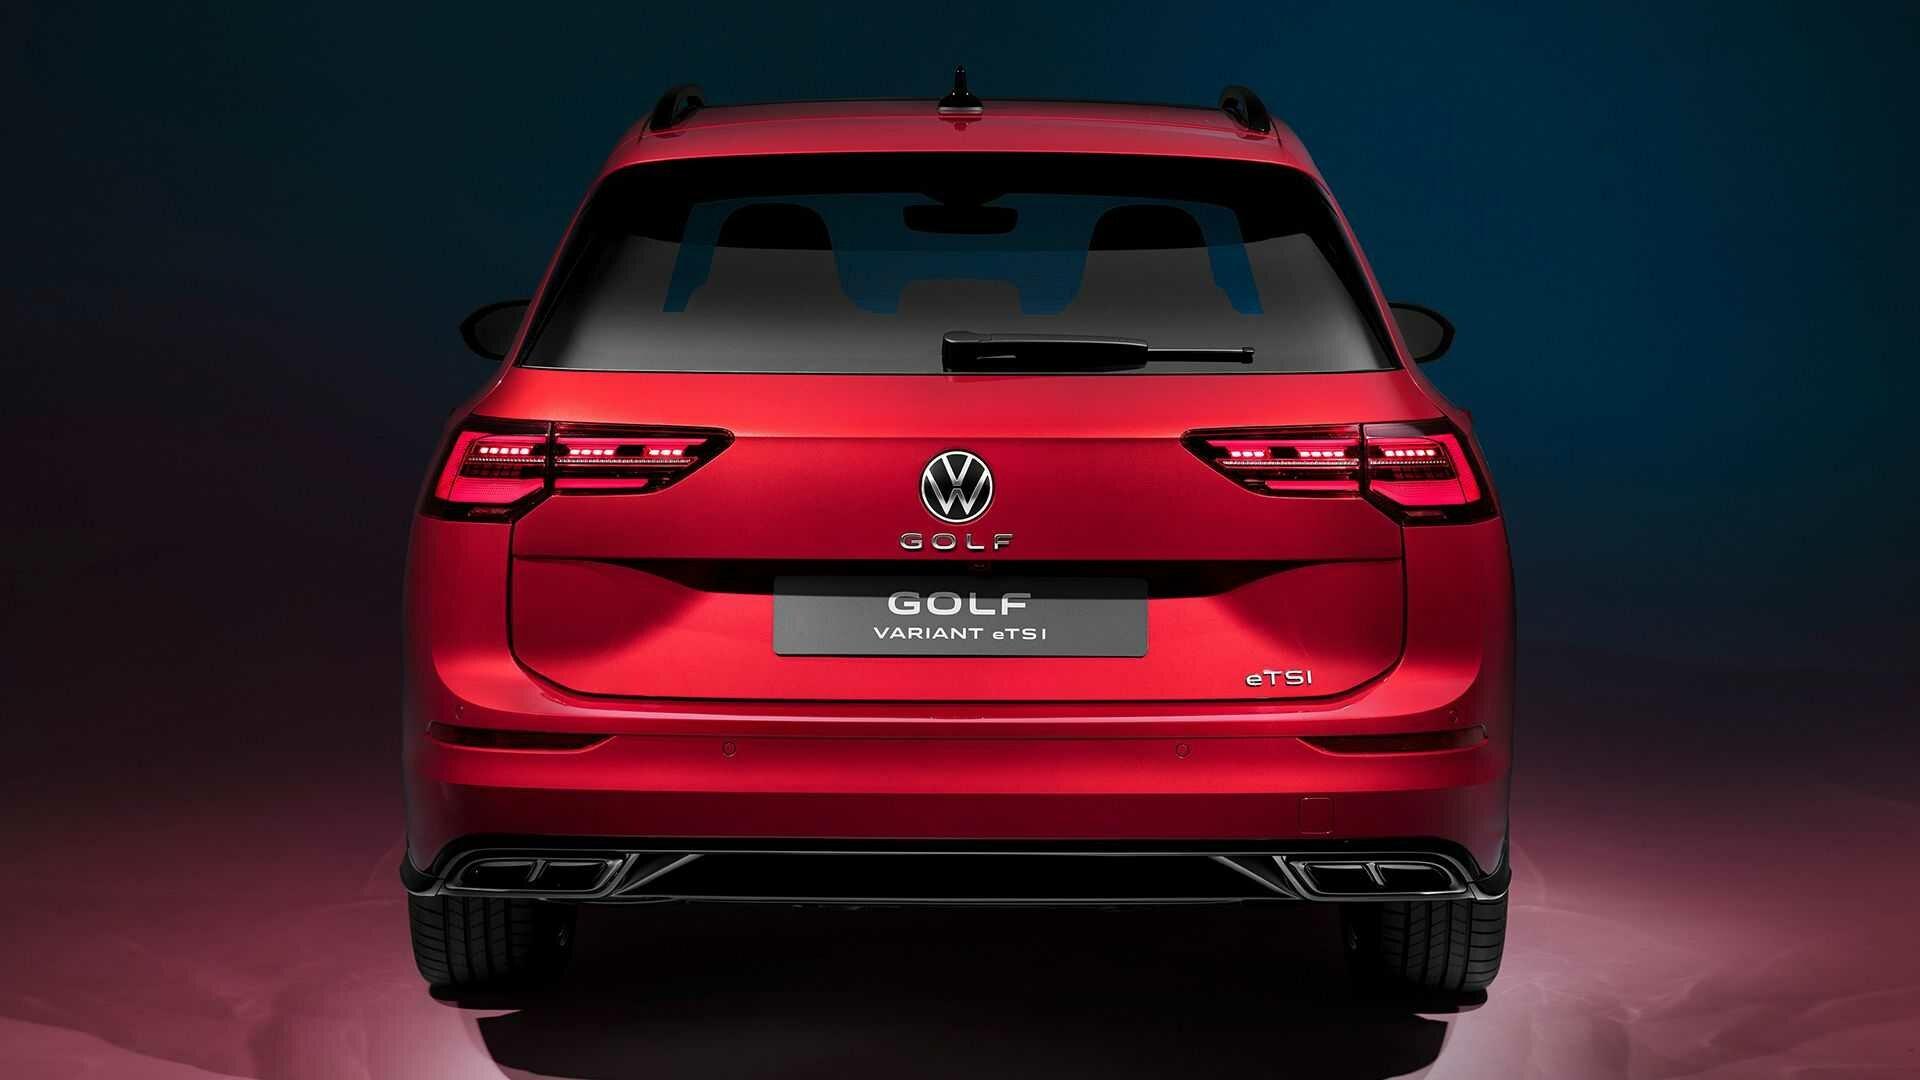 volkswagen-golf-variant-r-line-2020_(2).